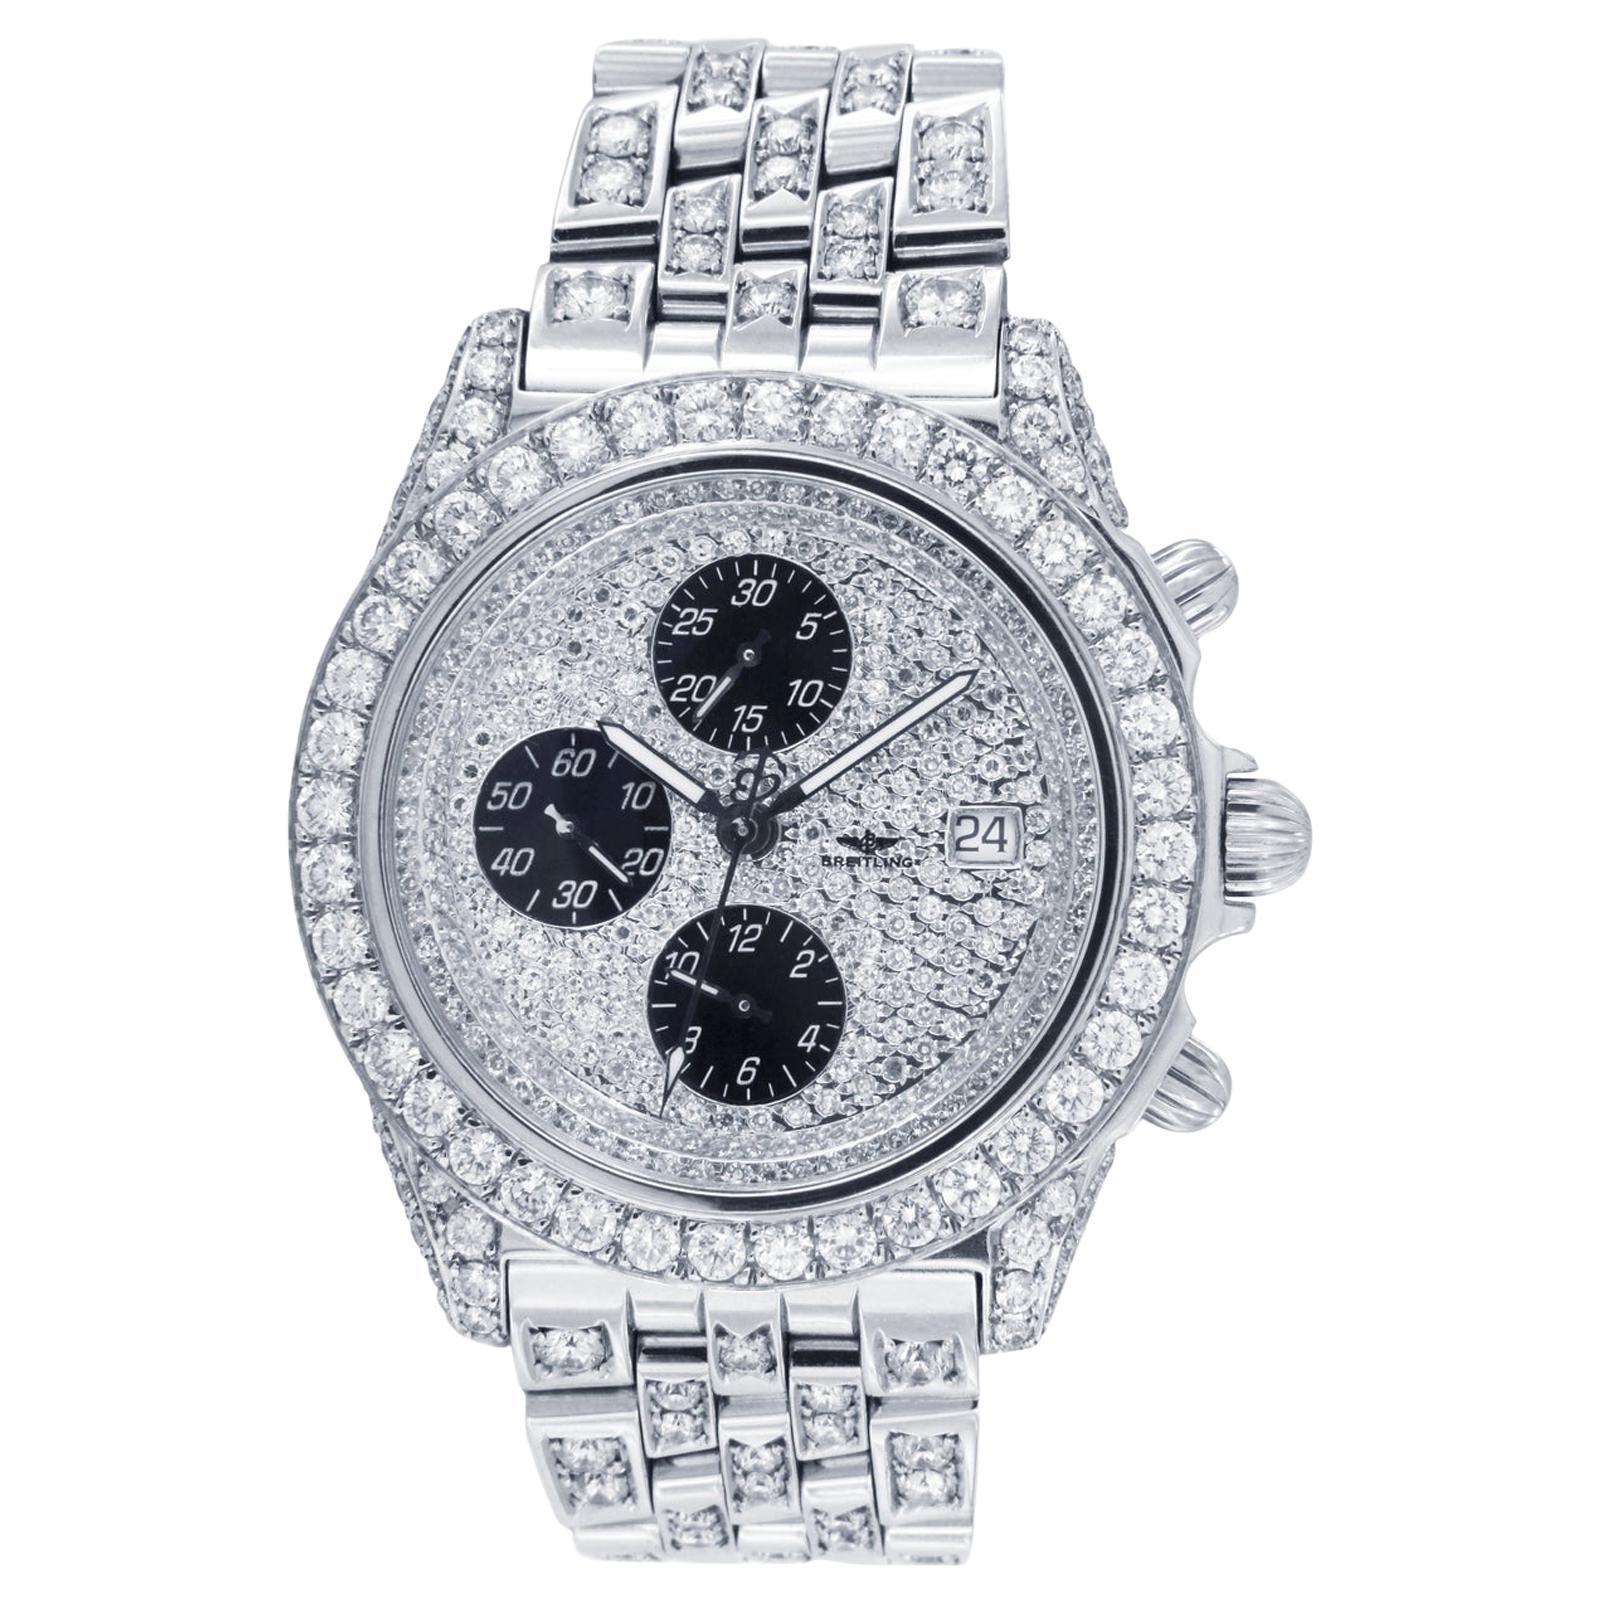 Breitling Crosswind Chronograph Automatic Diamond Watch A13355